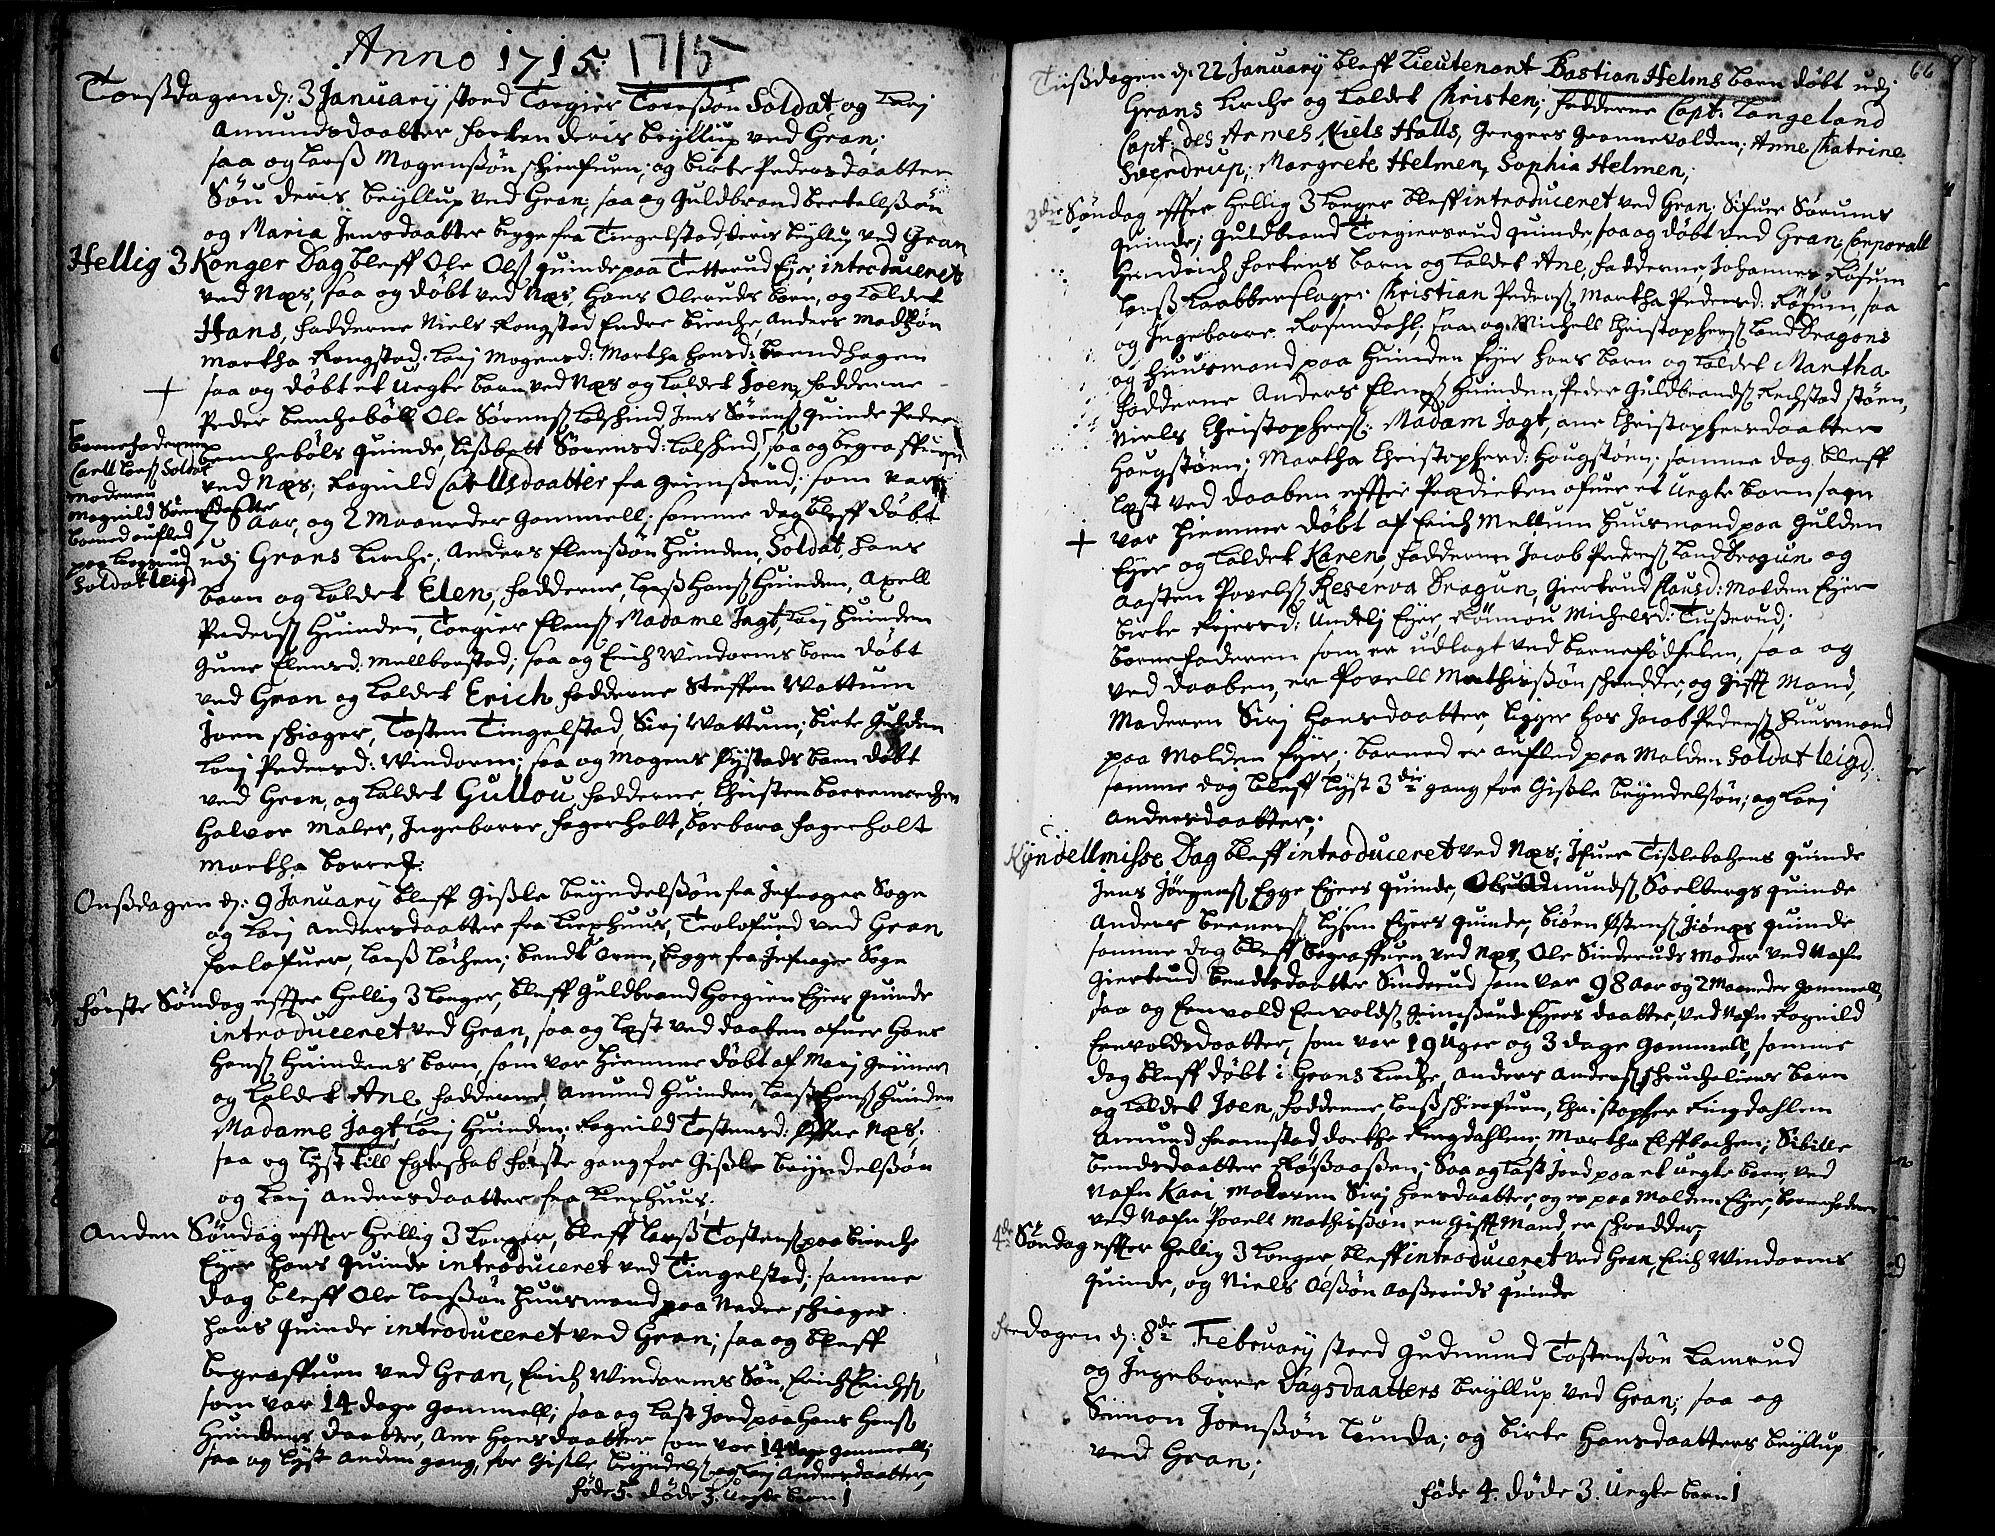 SAH, Gran prestekontor, Ministerialbok nr. 1, 1707-1731, s. 66